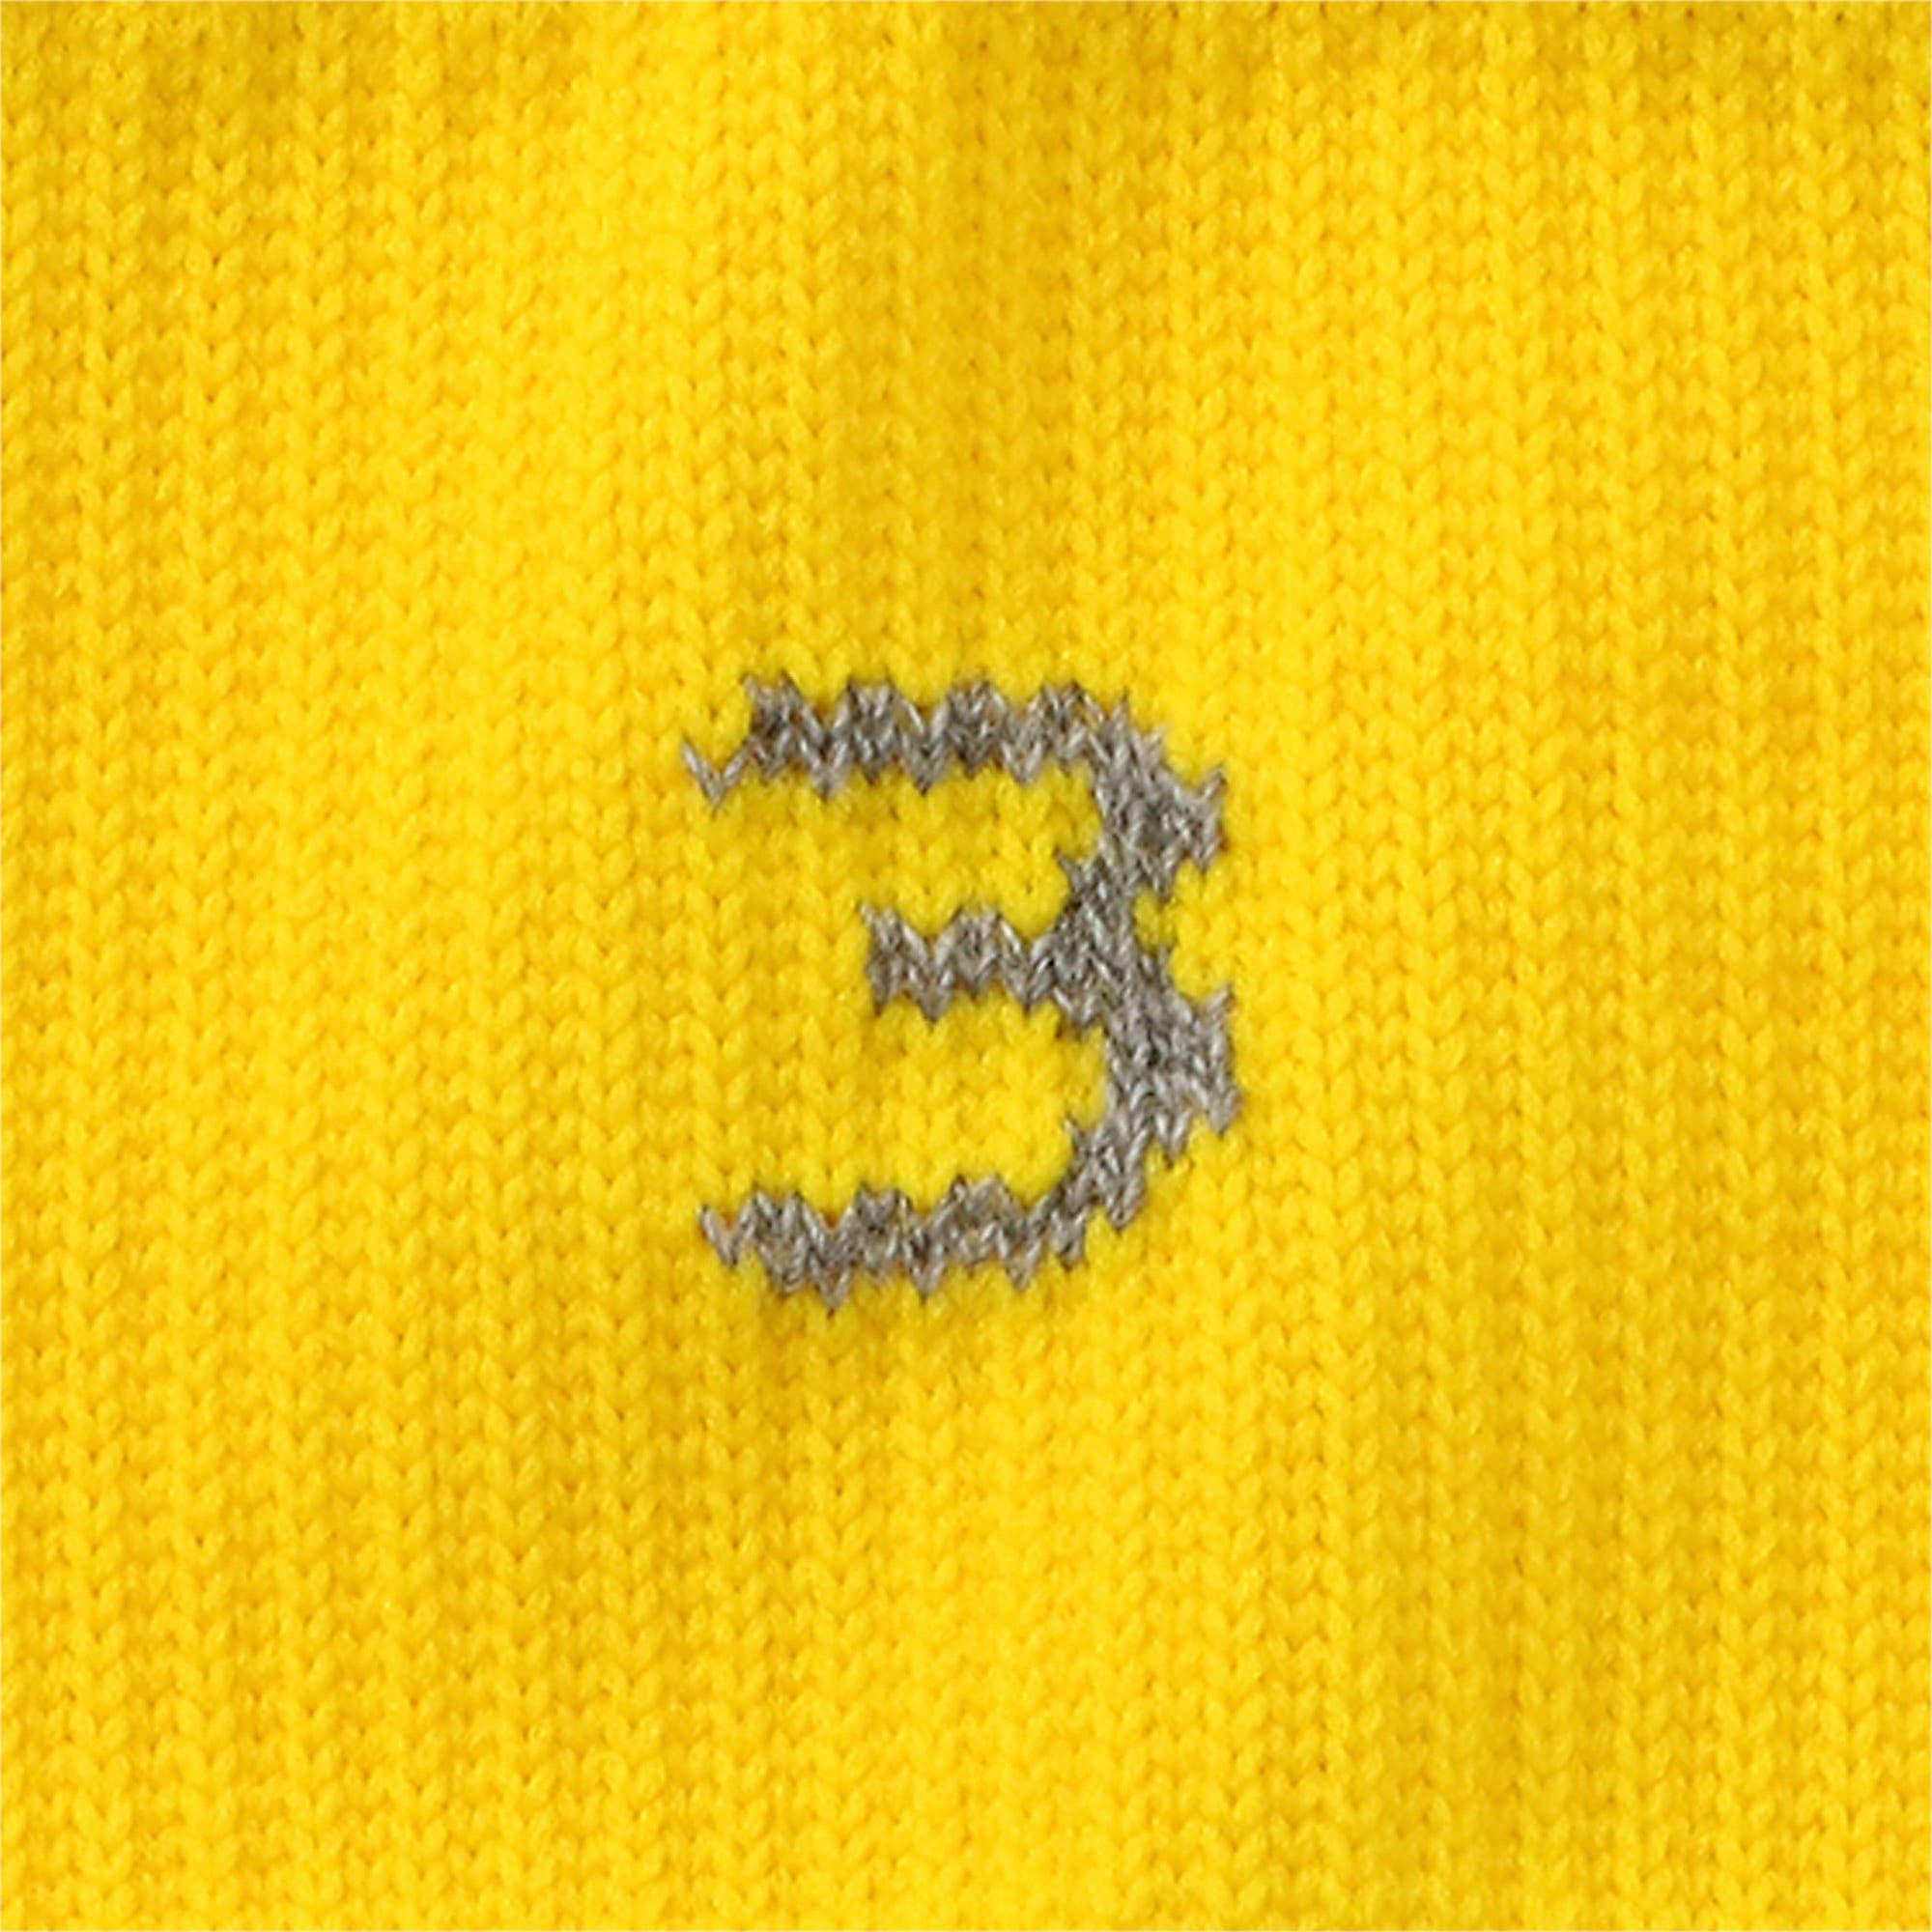 Thumbnail 6 of BVB フープド ストッキング, Cyber Yellow-Puma Black, medium-JPN